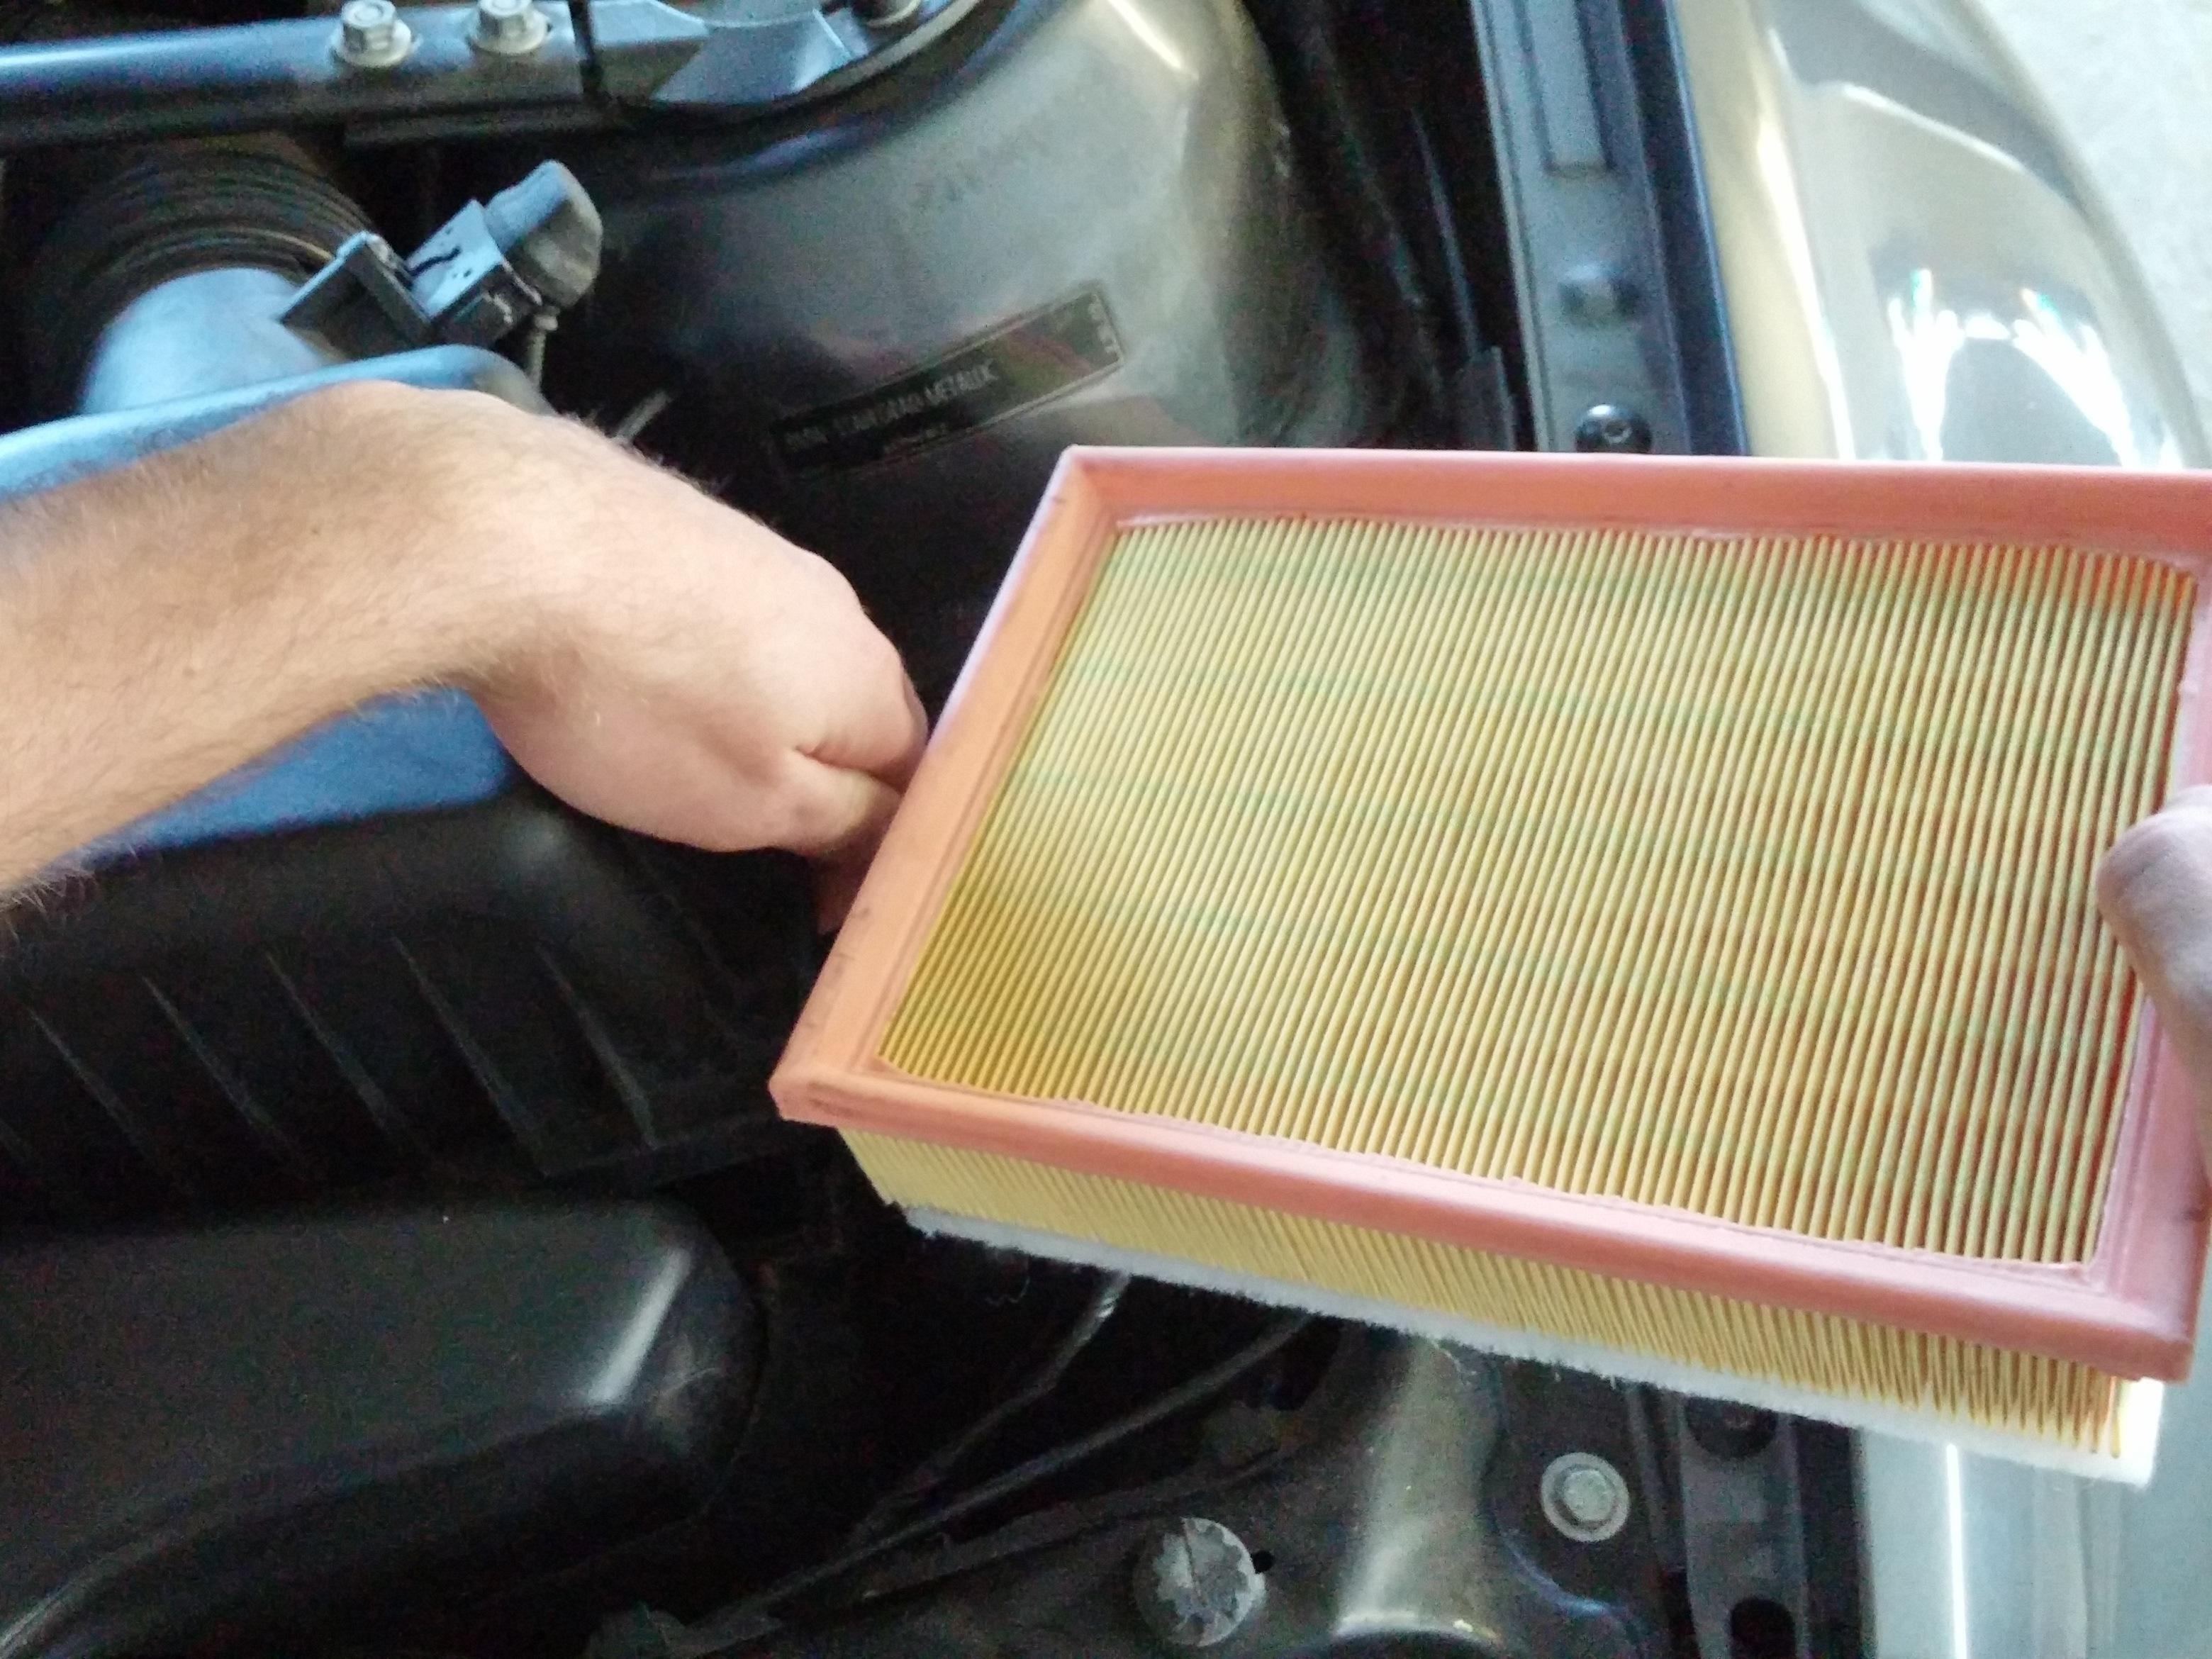 Bmw Repair Ifixit 1996 Z3 Engine Diagram 2000 2006 M3 Air Filter Replacement